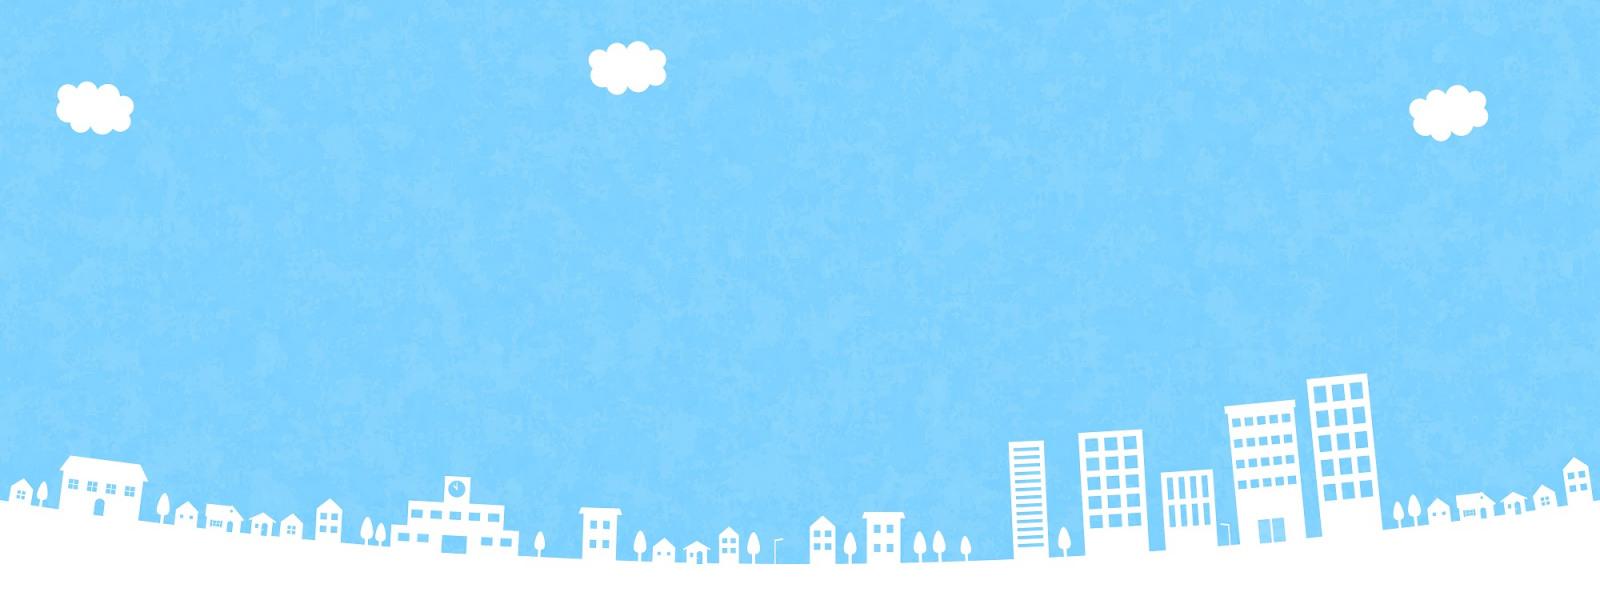 Salesperson Fundamentals of Real Estate Courses